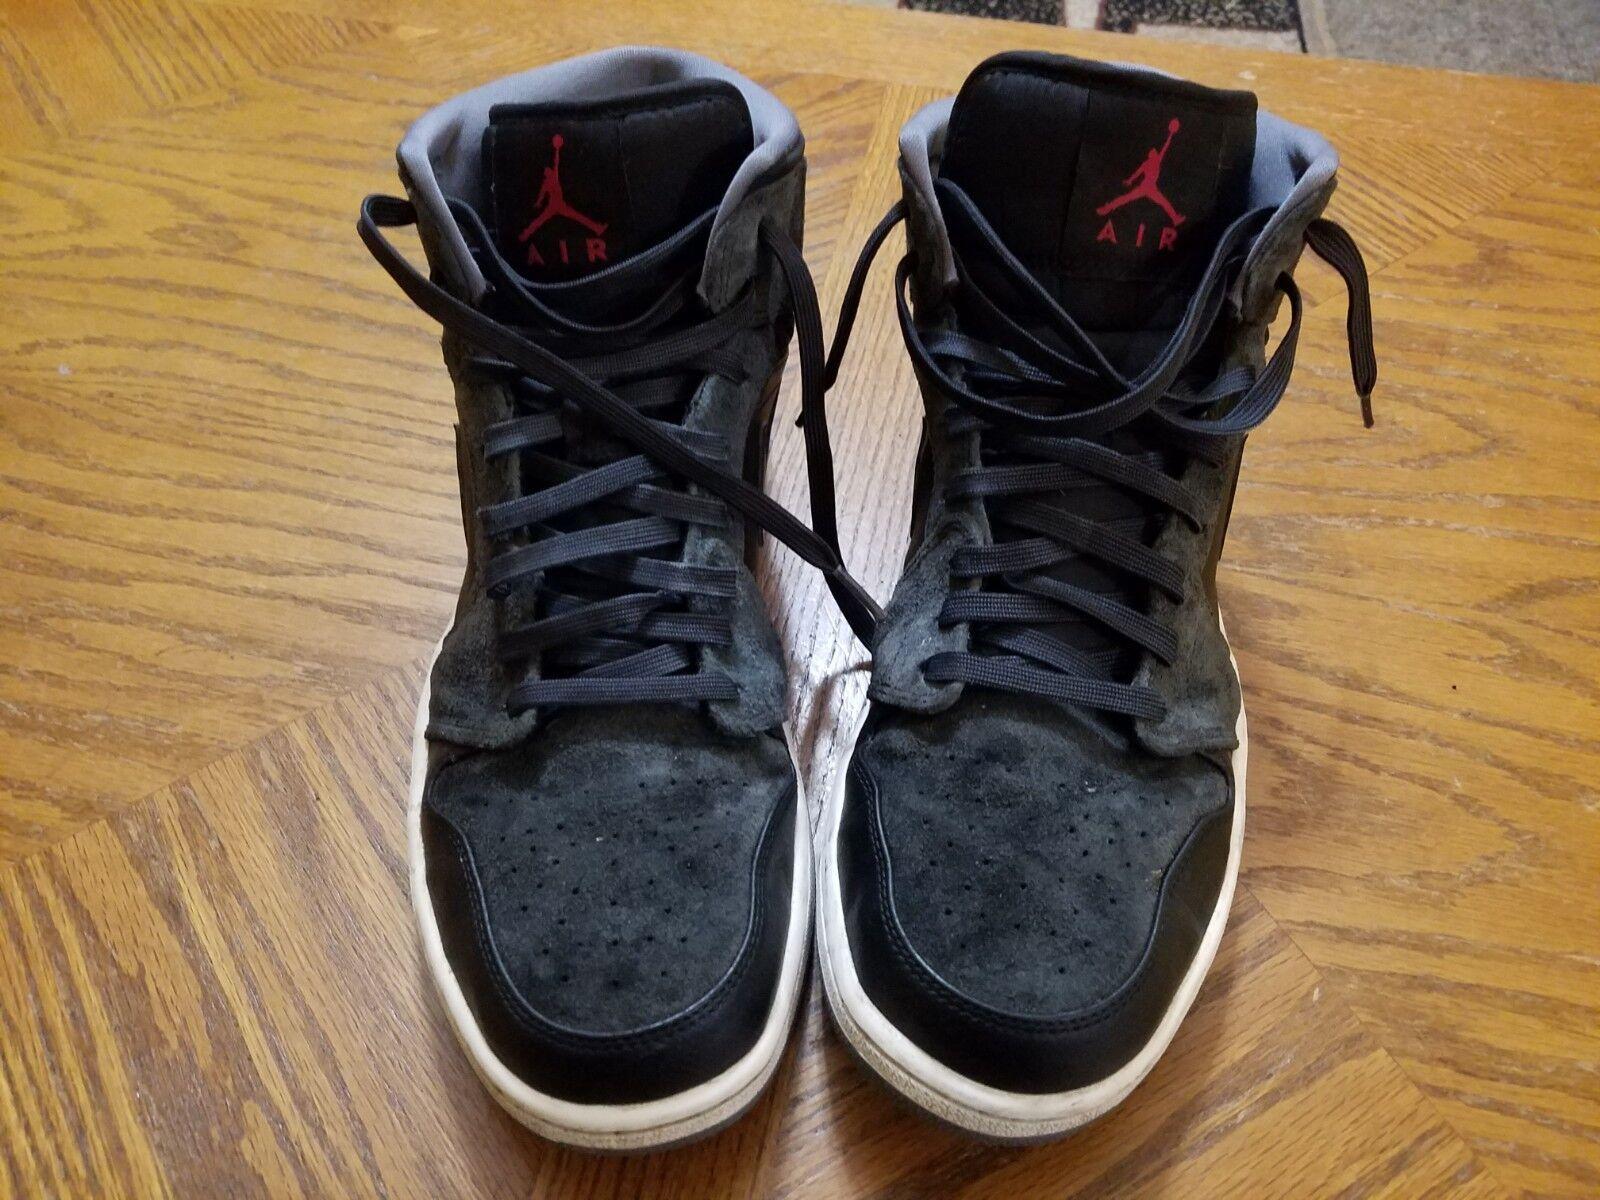 Nike Air Jordan Retro 1 Mid Black & Anthracite (554724-018) Mens Size 13